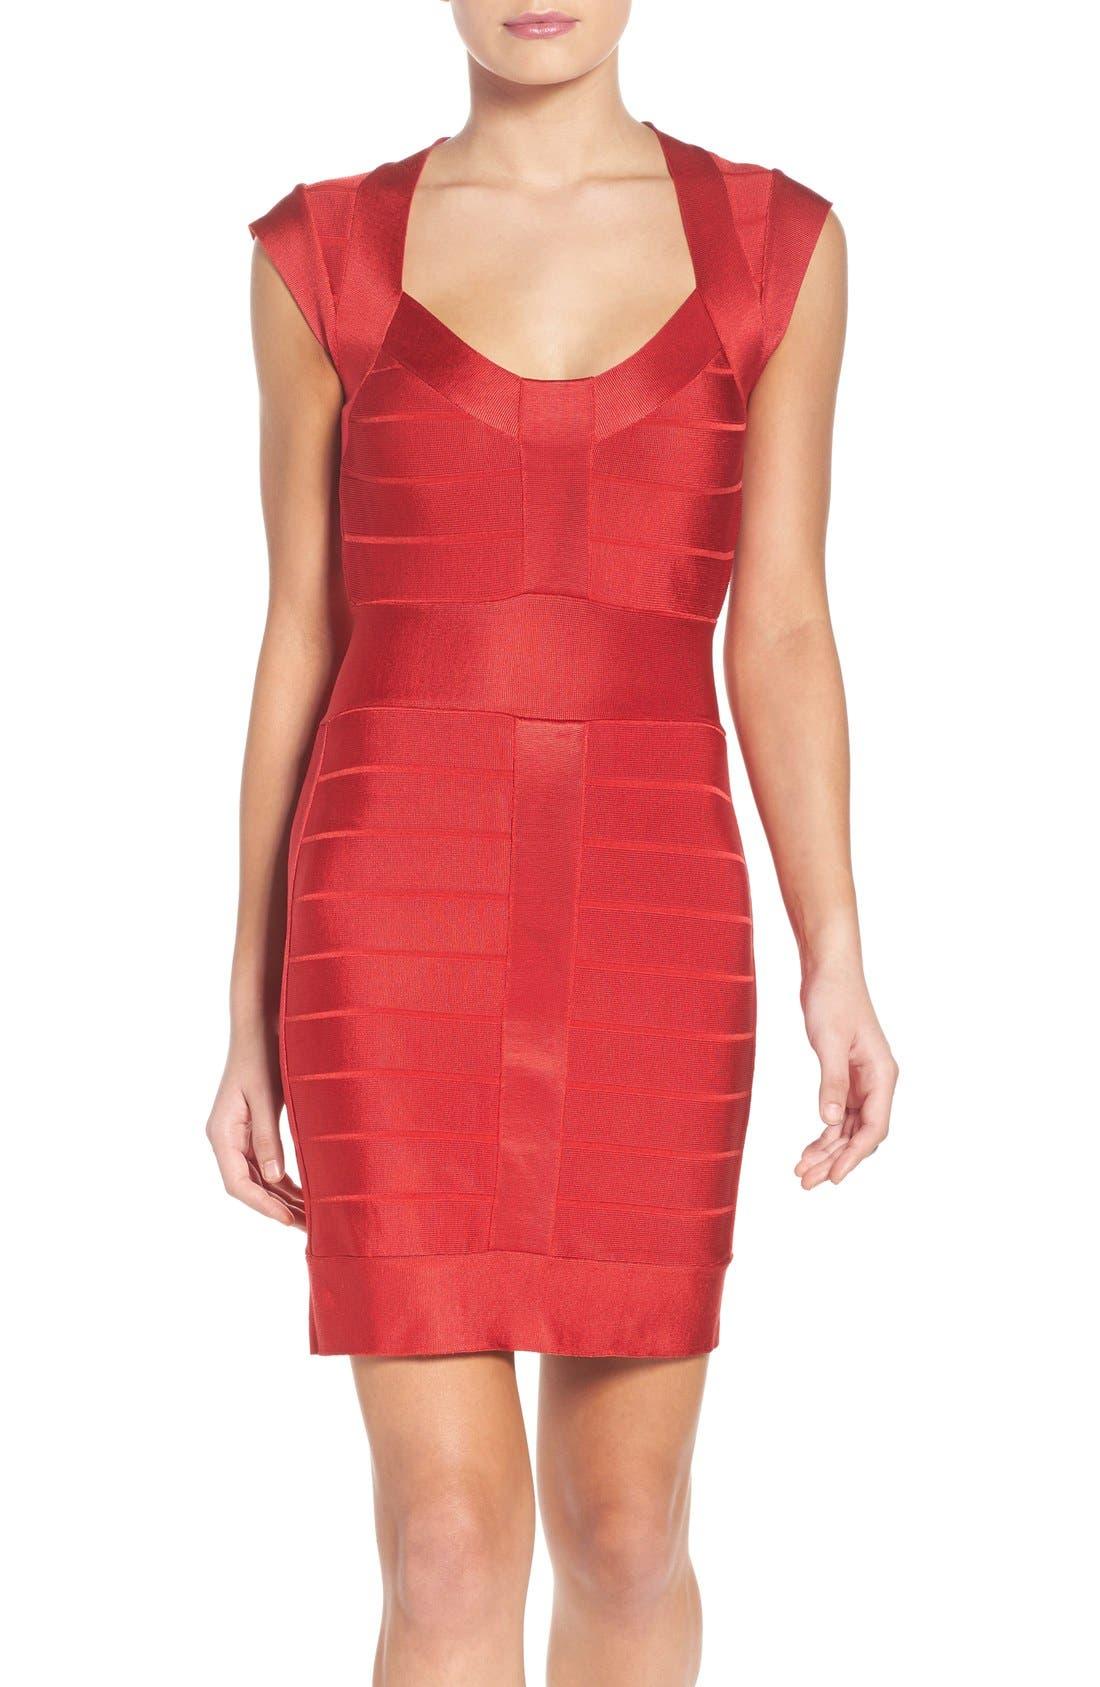 French Connection Spotlight Bandage Dress